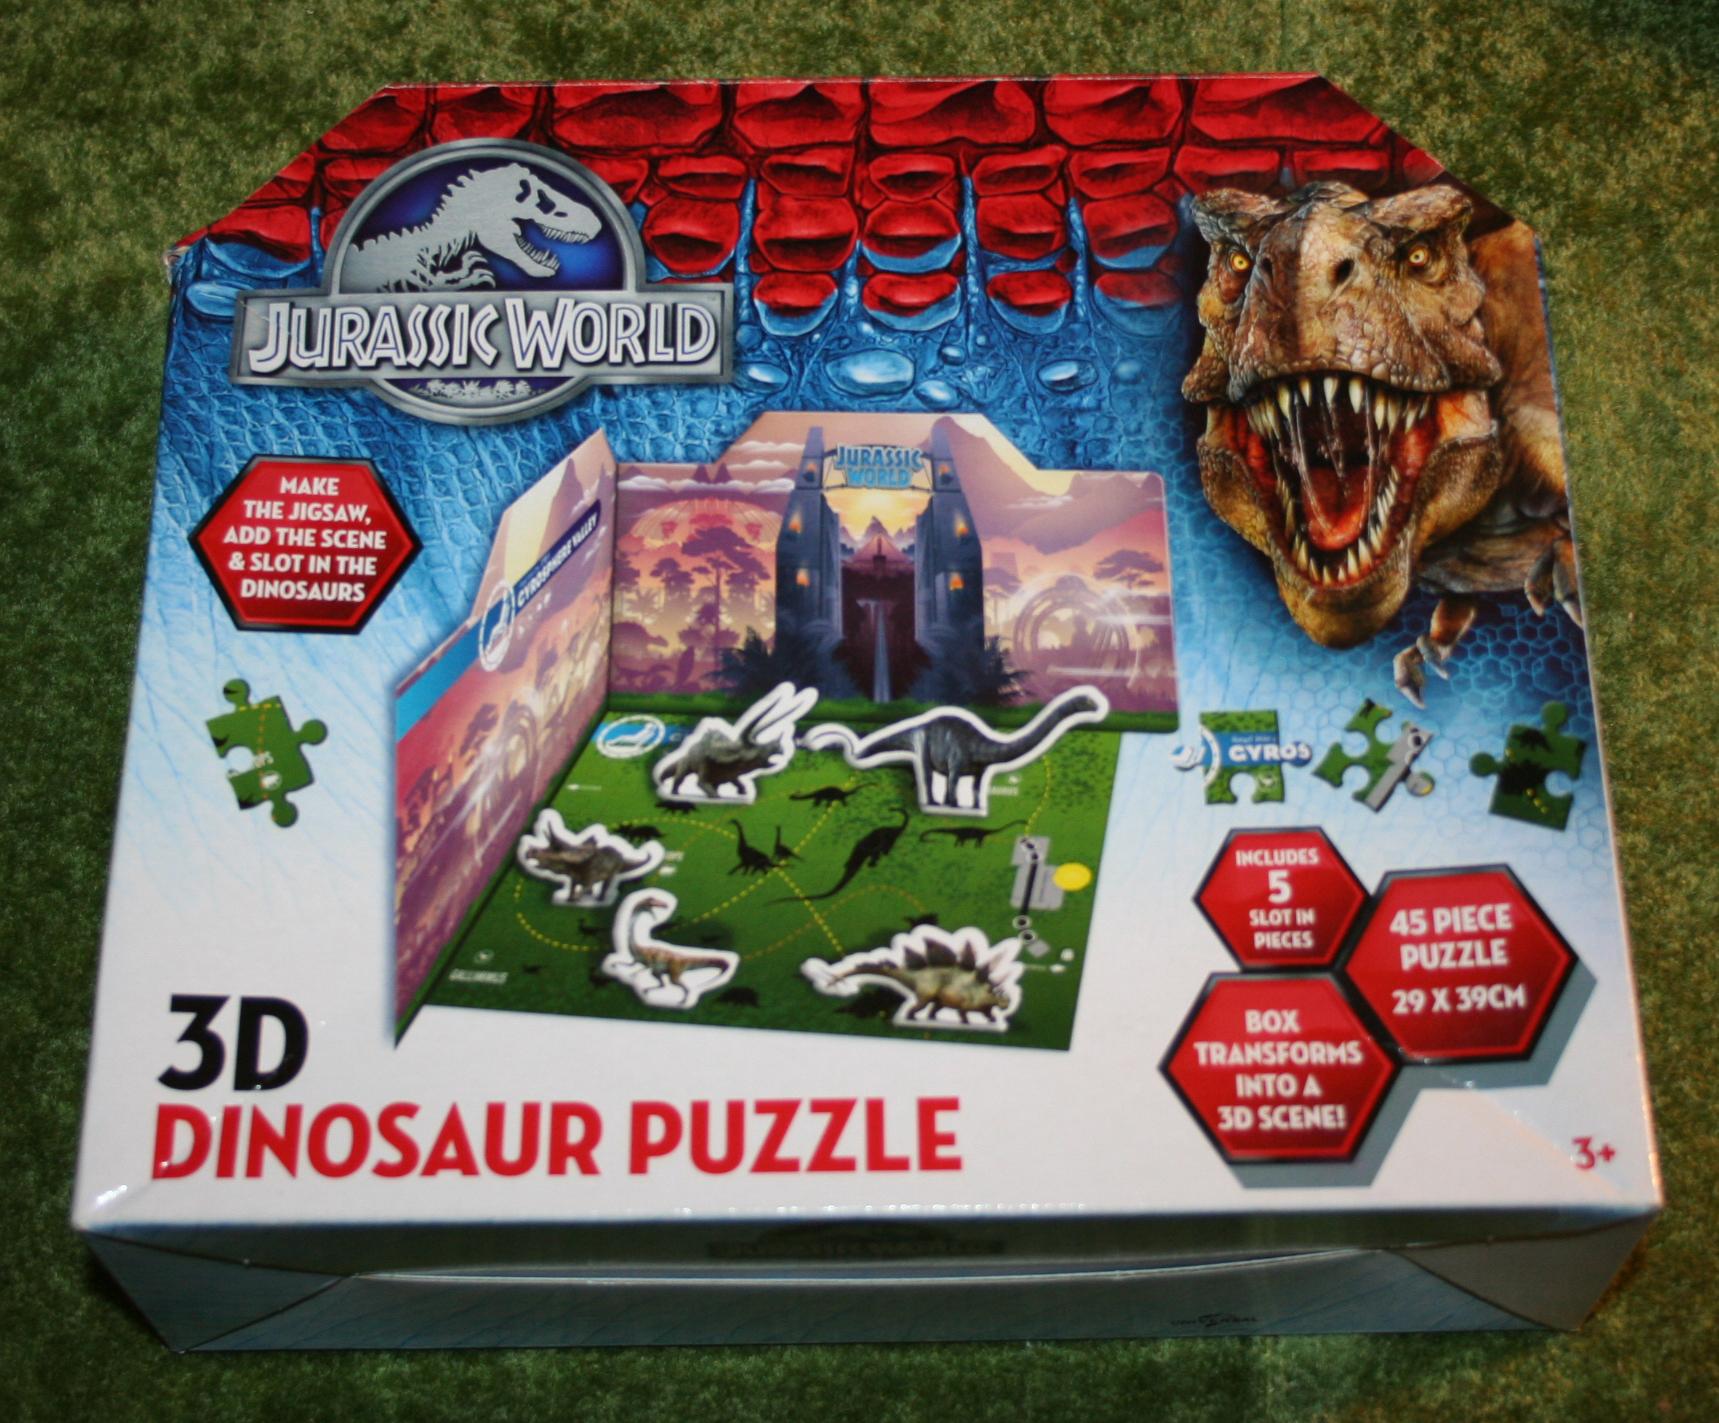 Jurassic World 3d Dinosaur Puzzle